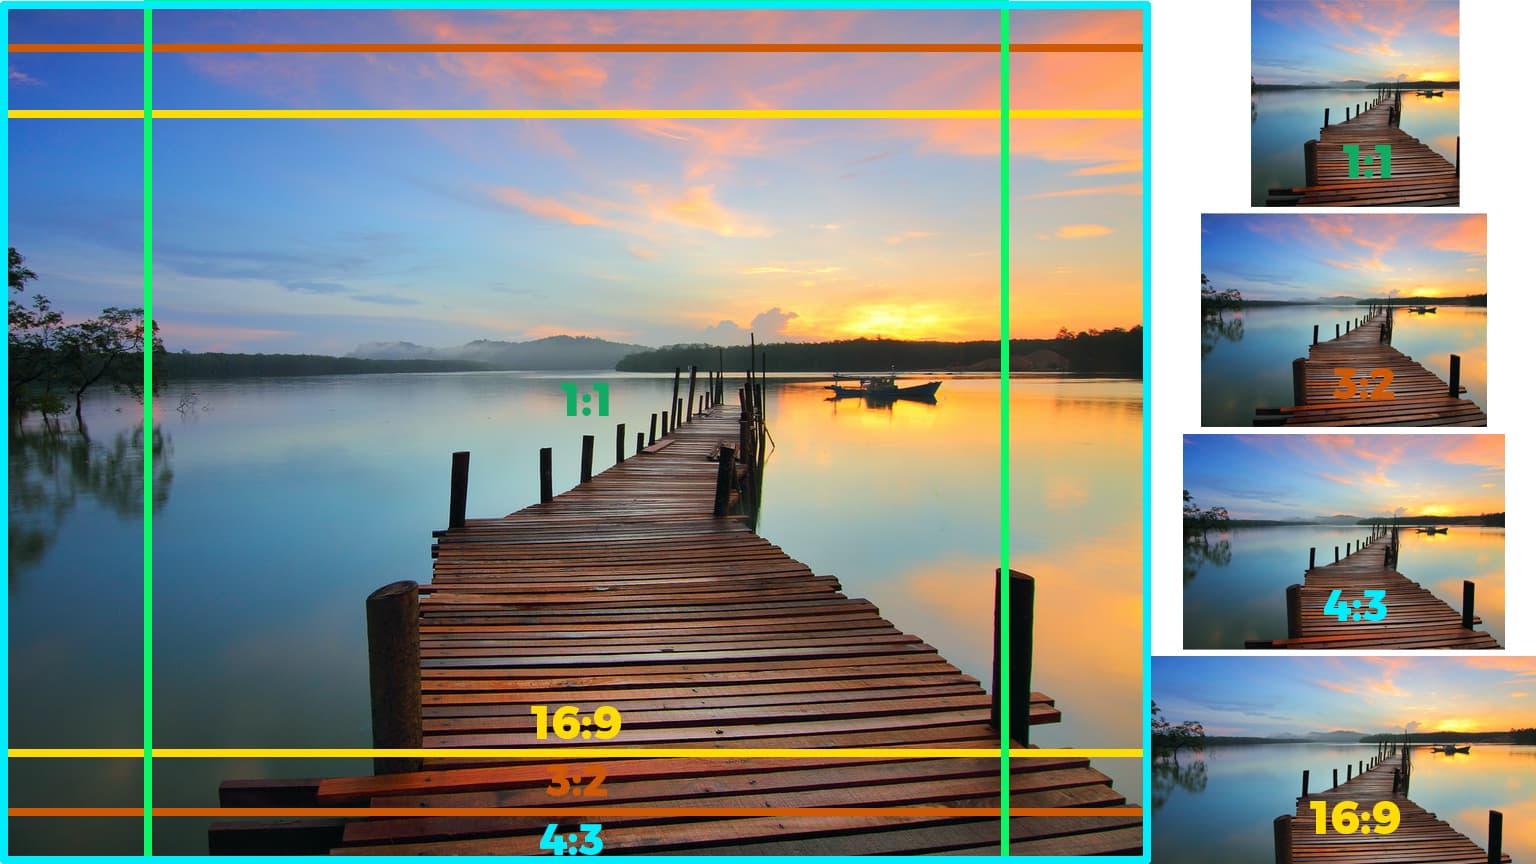 Different aspect ratios